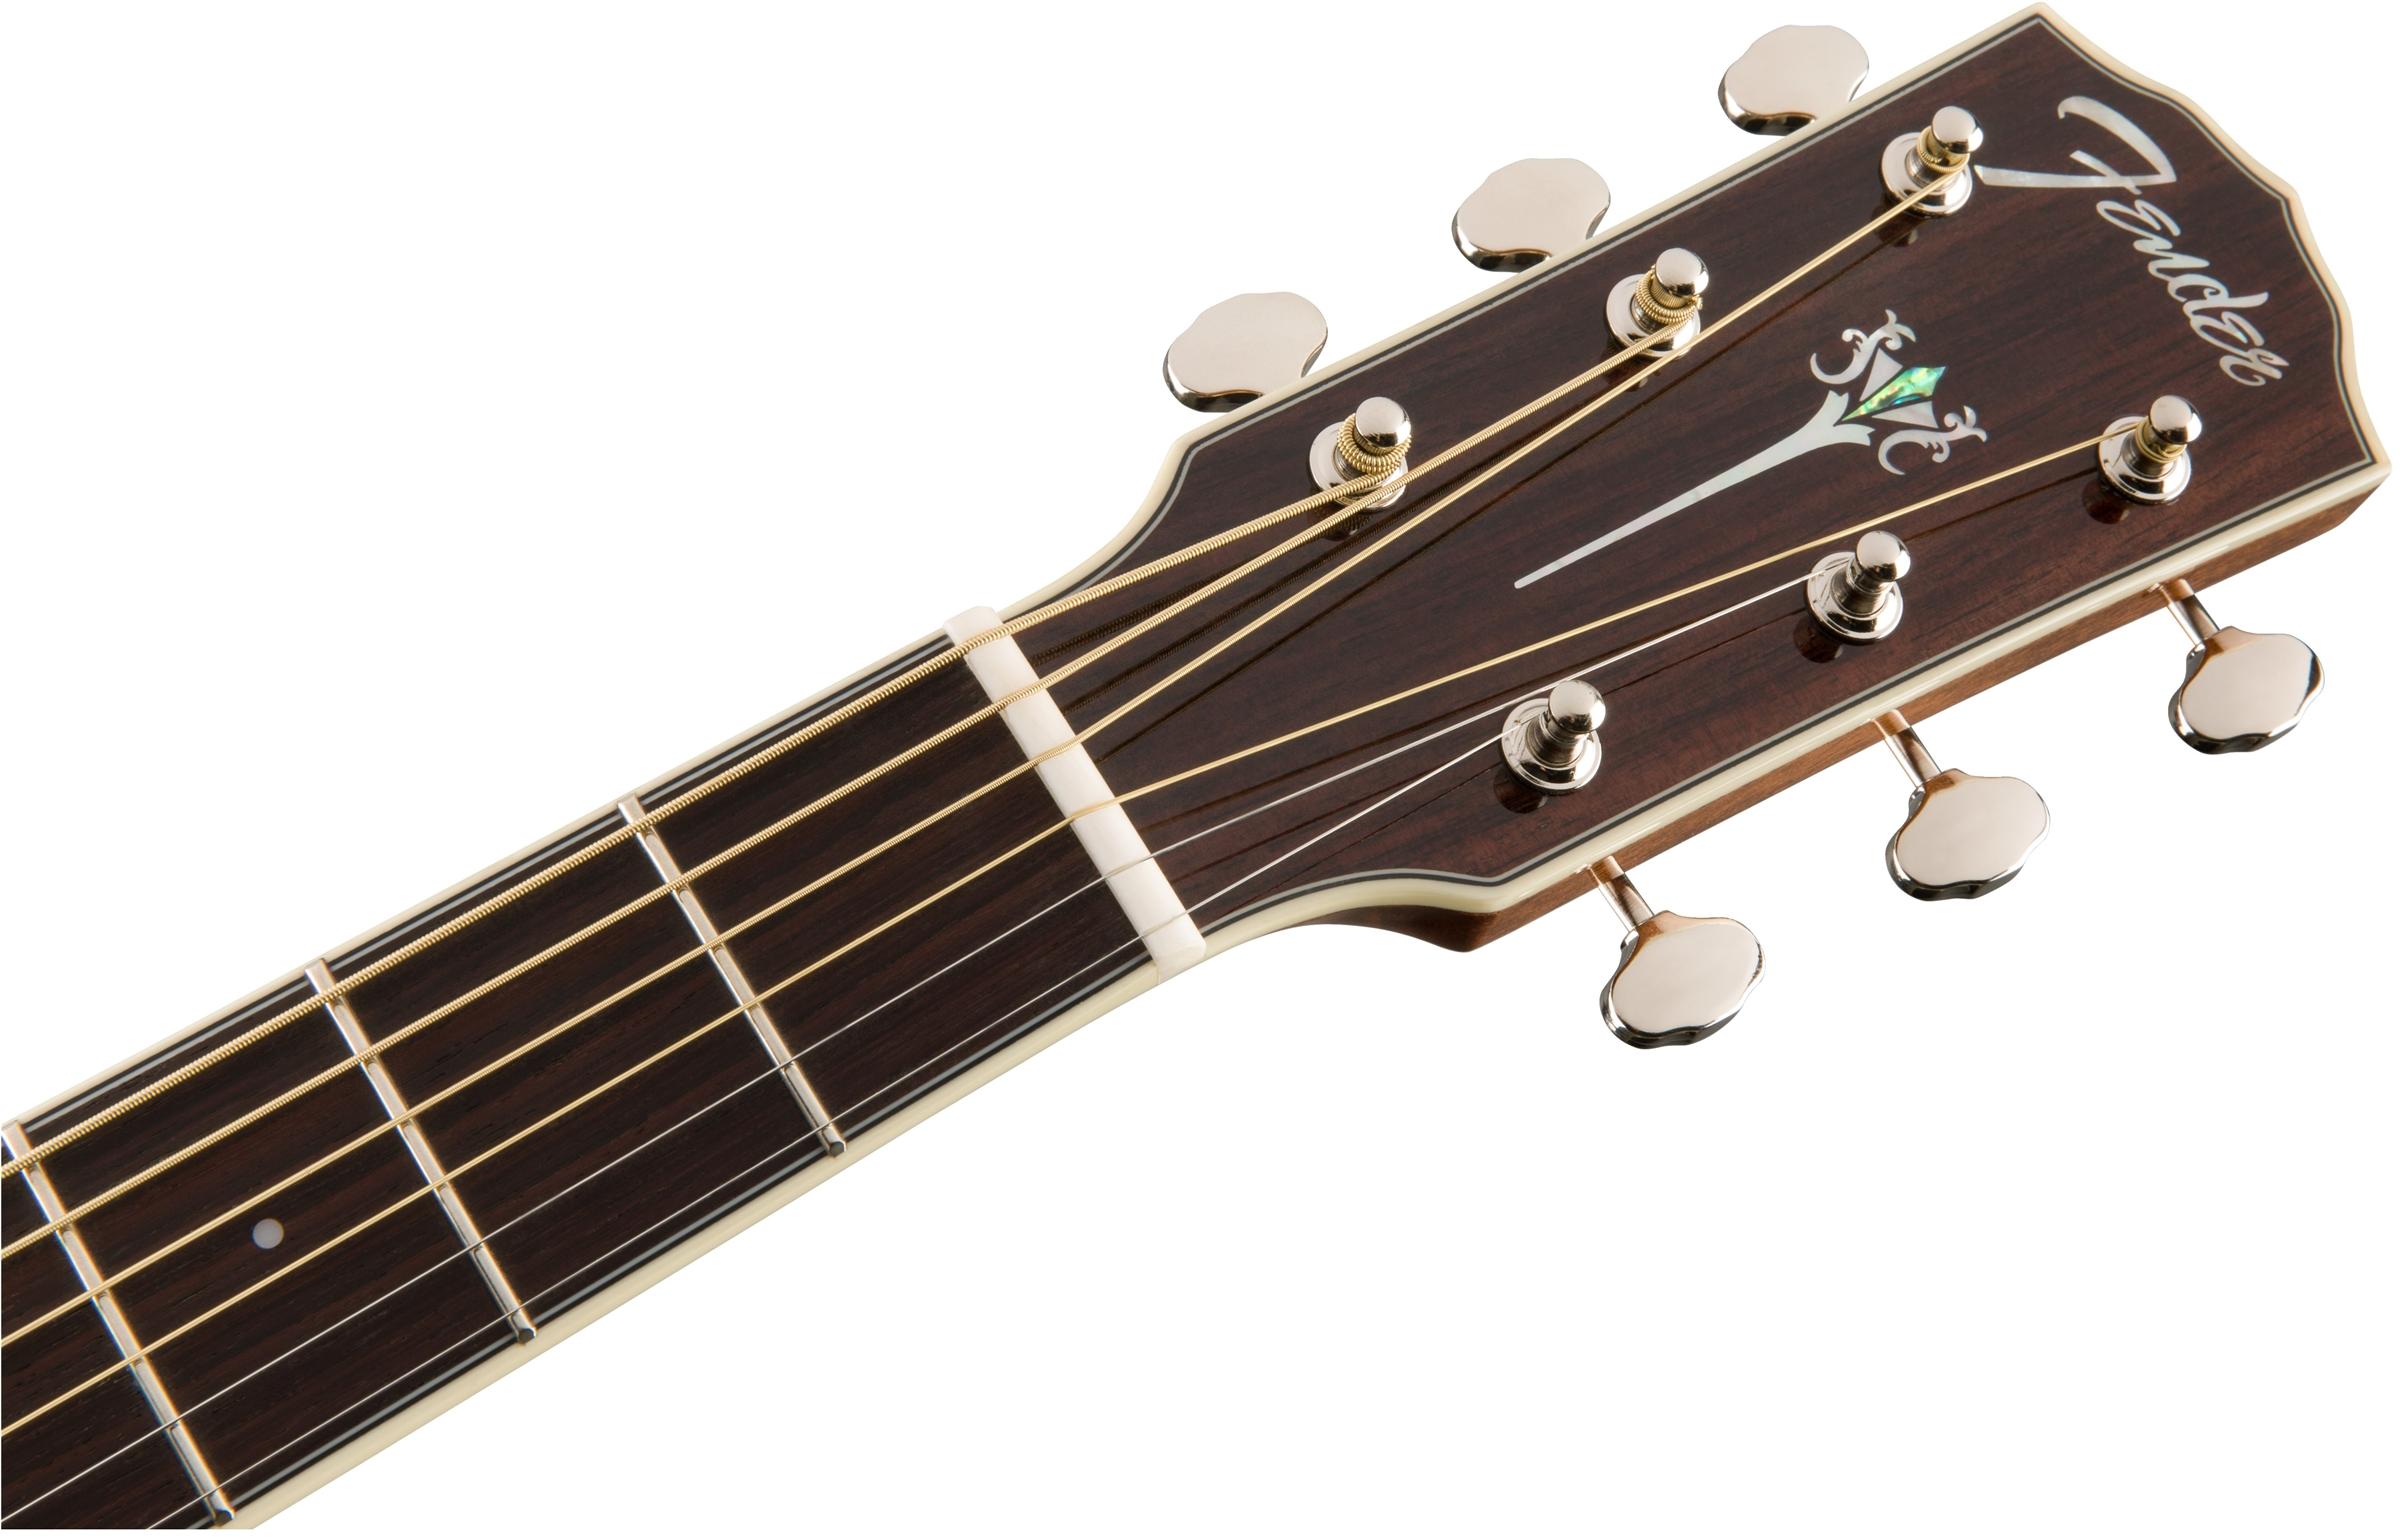 Afinador de guitarra electro acoustica online dating